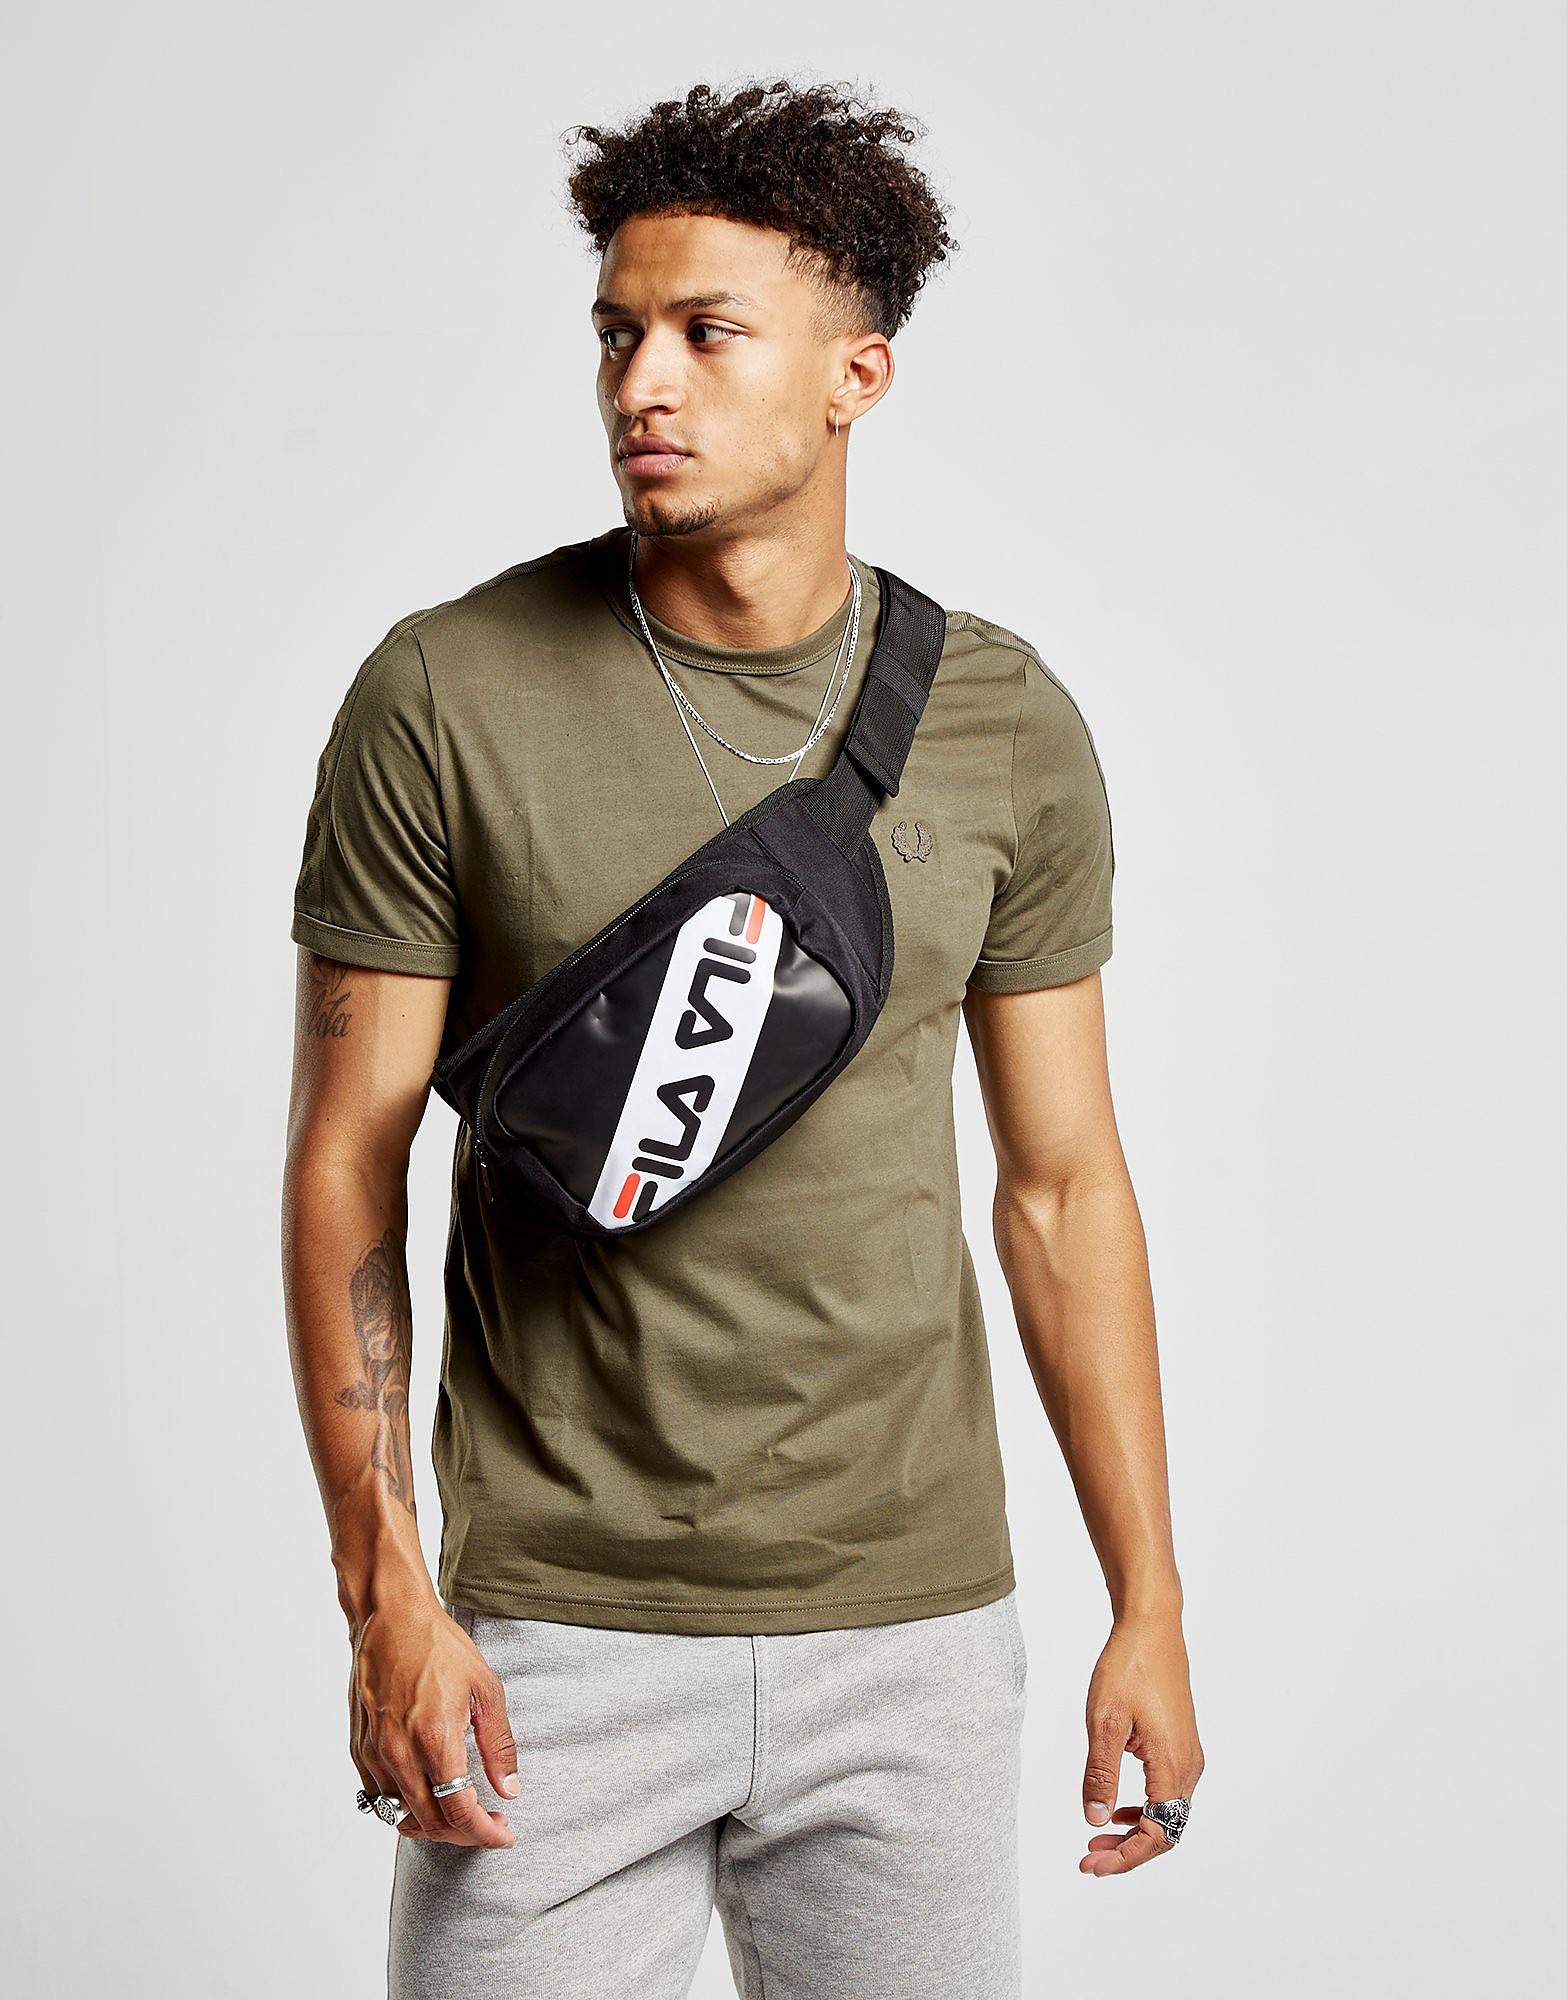 Fila Ola Waist Bag